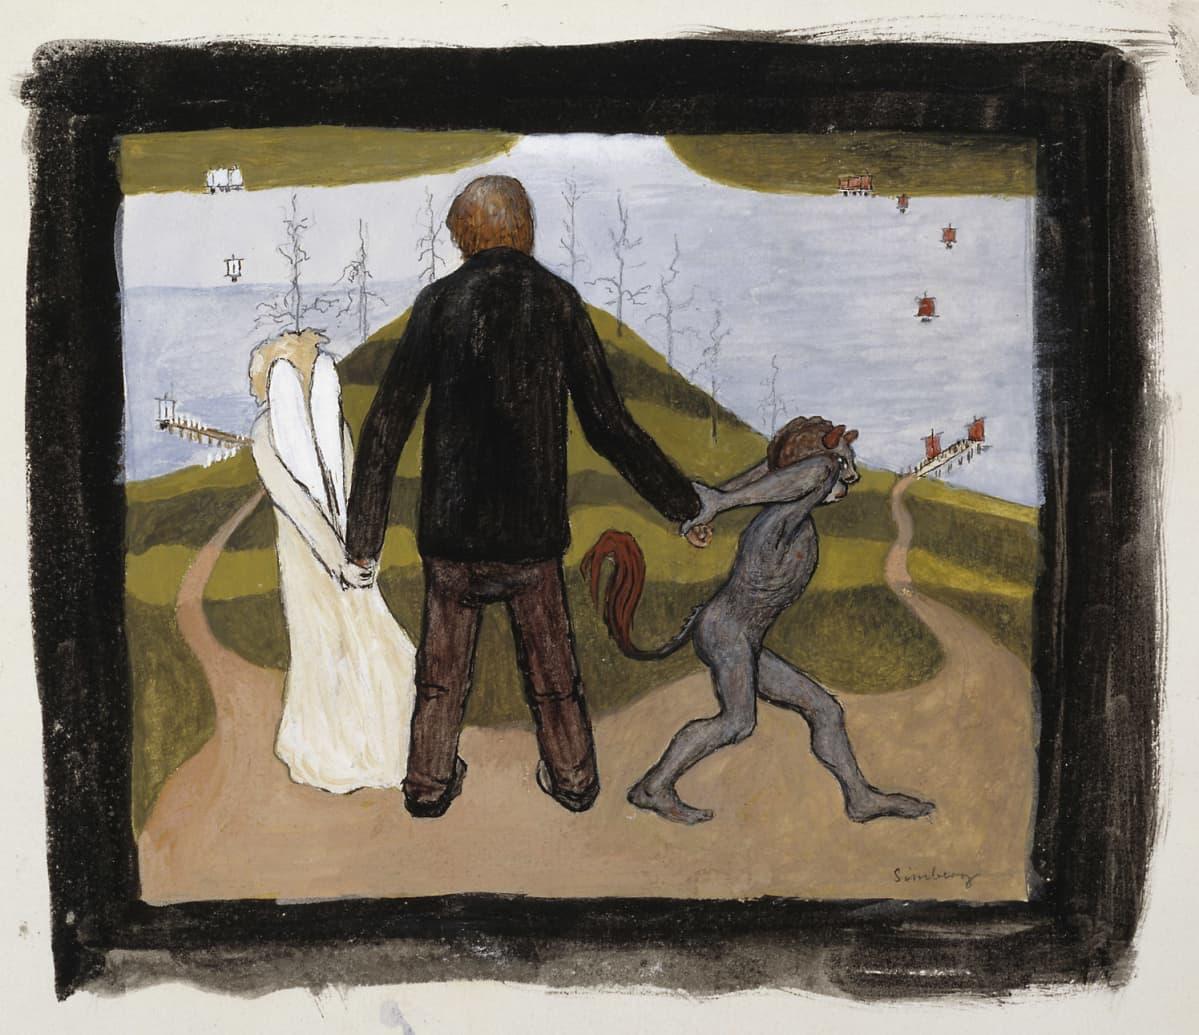 Hugo Simberg: Tienhaarassa